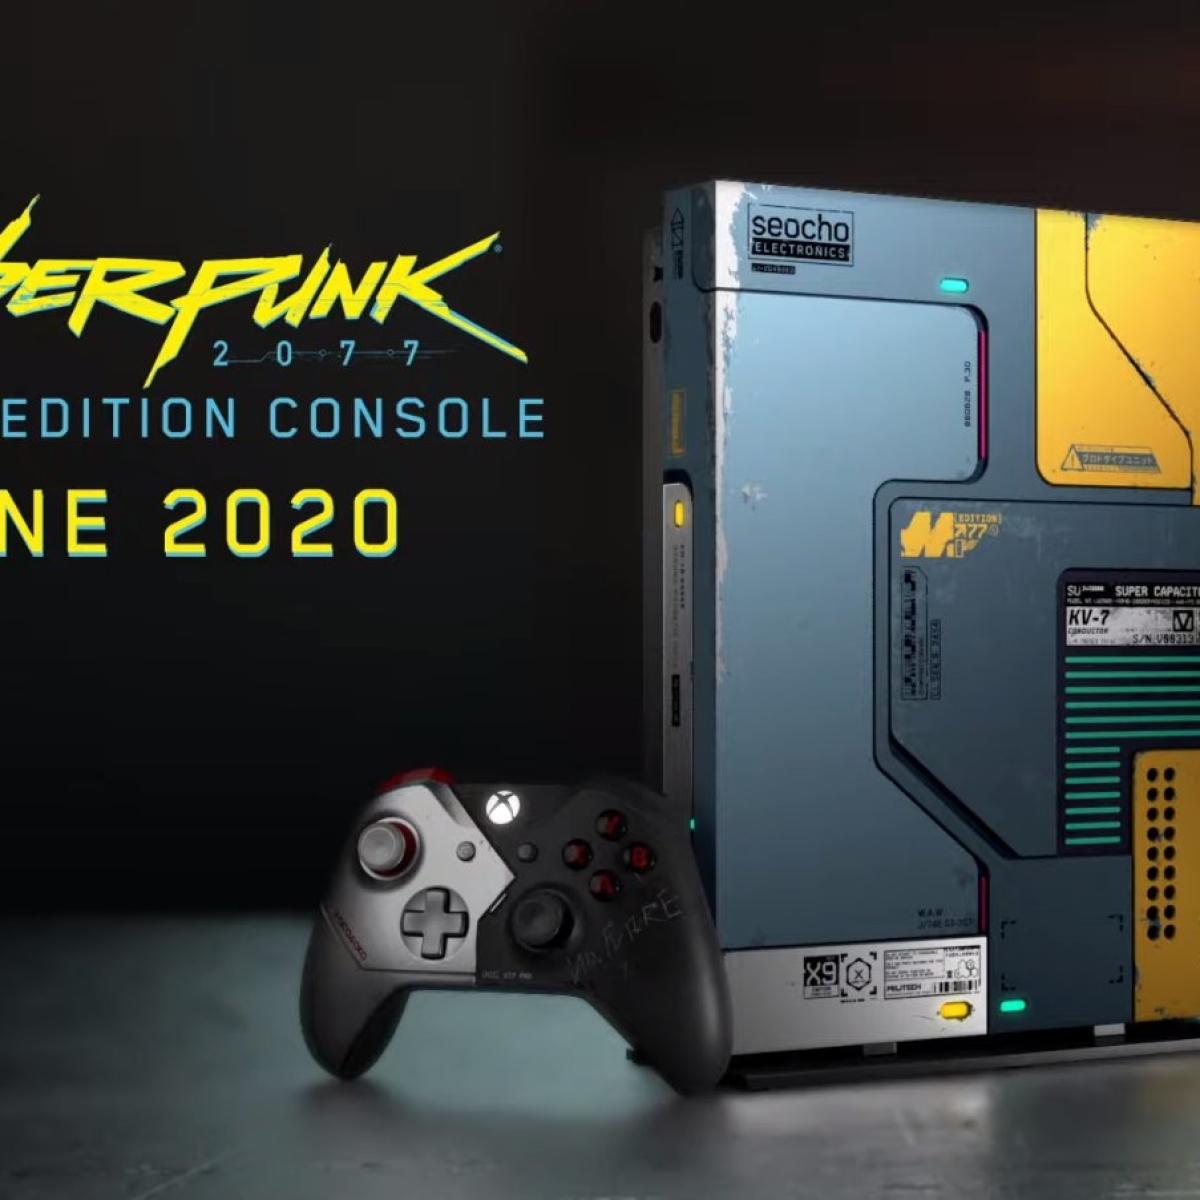 Microsoft's Cyberpunk-themed Xbox glows in the dark